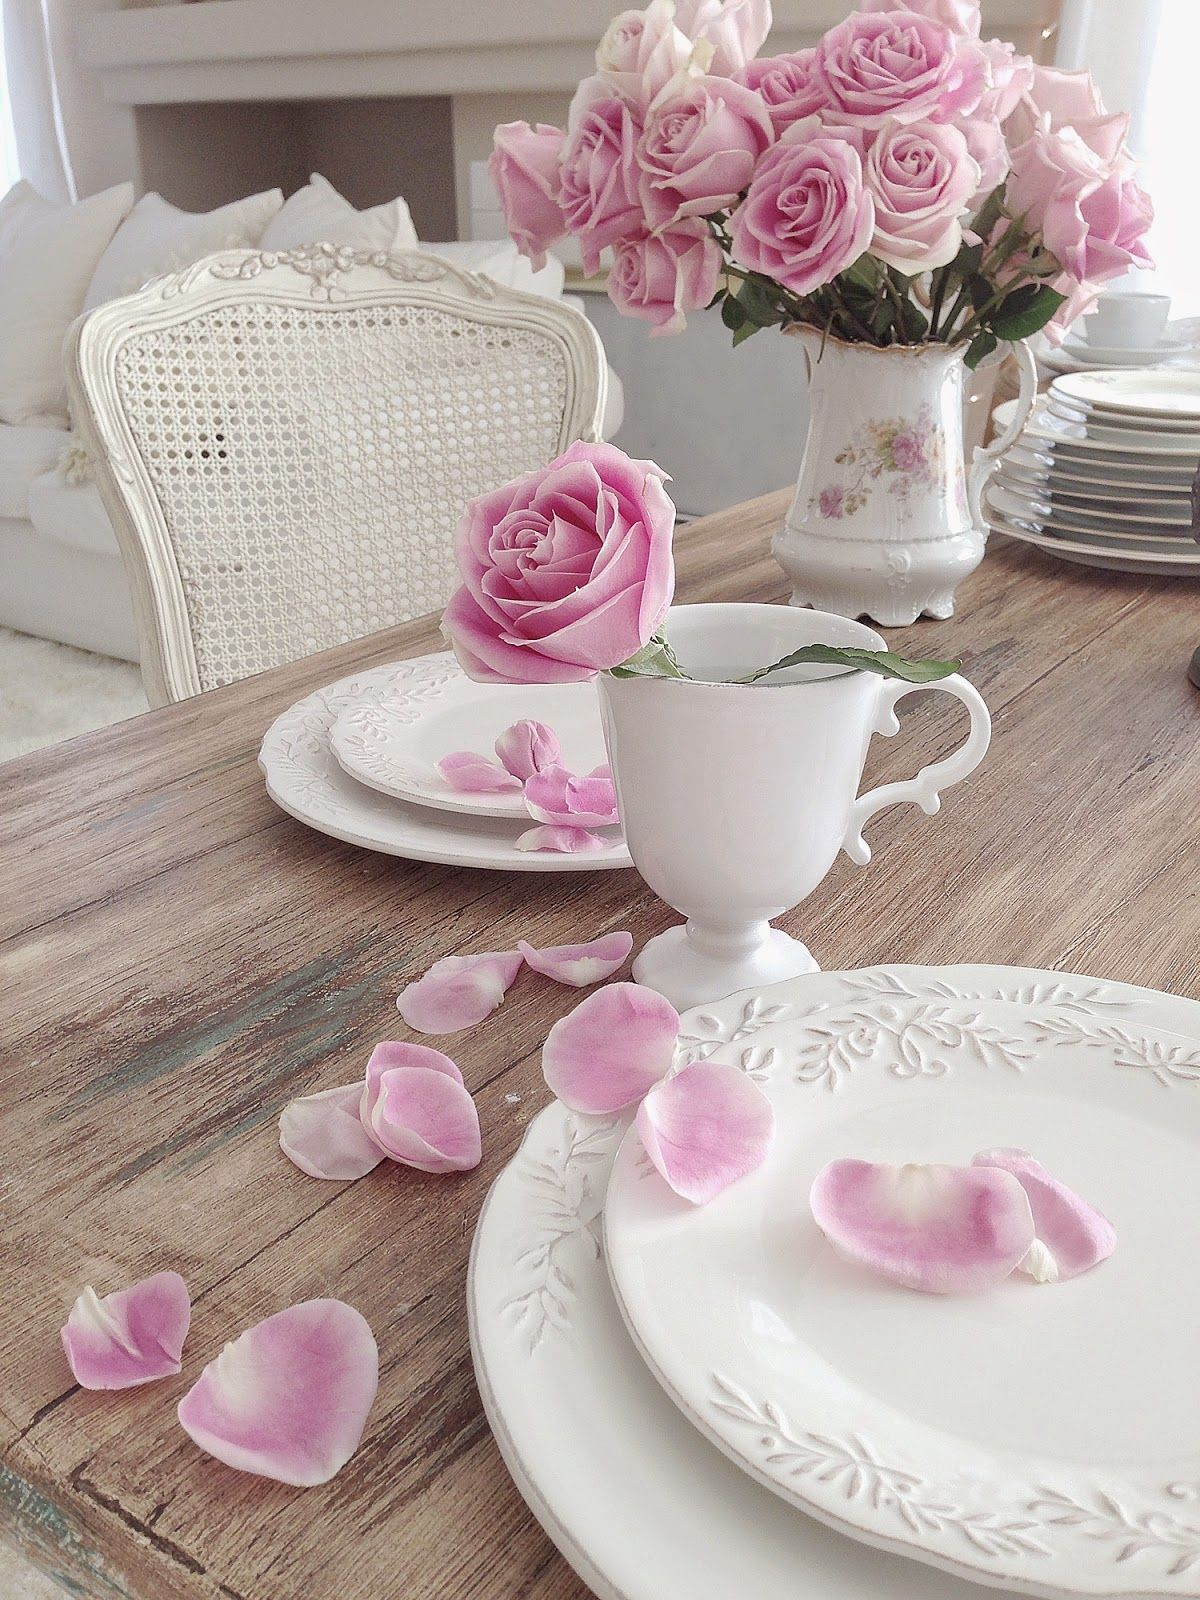 Romantic shabby chic home romantic shabby chic blog - My Shabby Chic Home Romantik Evim Romantik Ev Romantic Shabby Chic Romantic